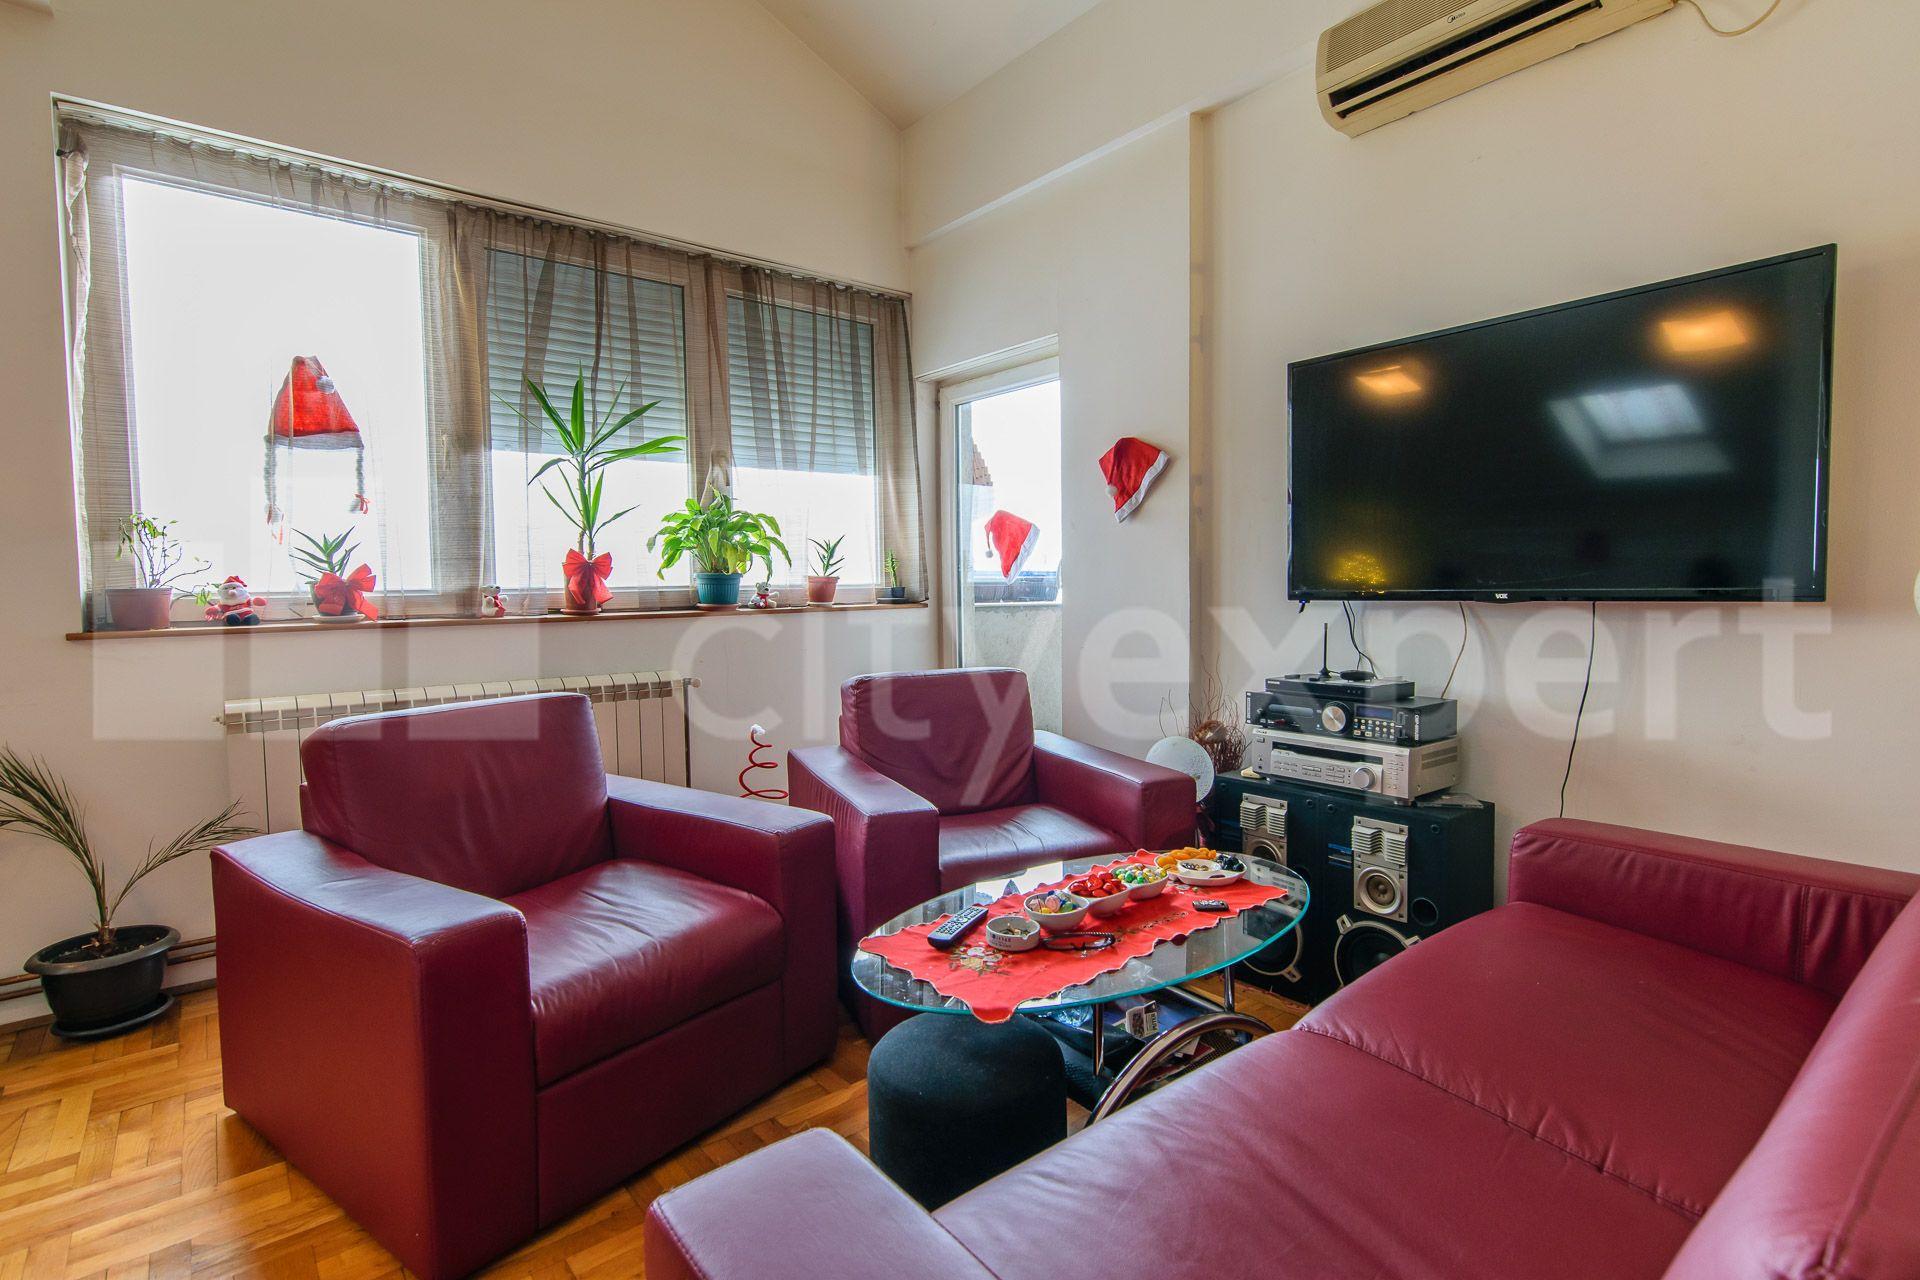 Sale Apartment Dragice Koncar Vozdovac Id 22972 Cityexpert